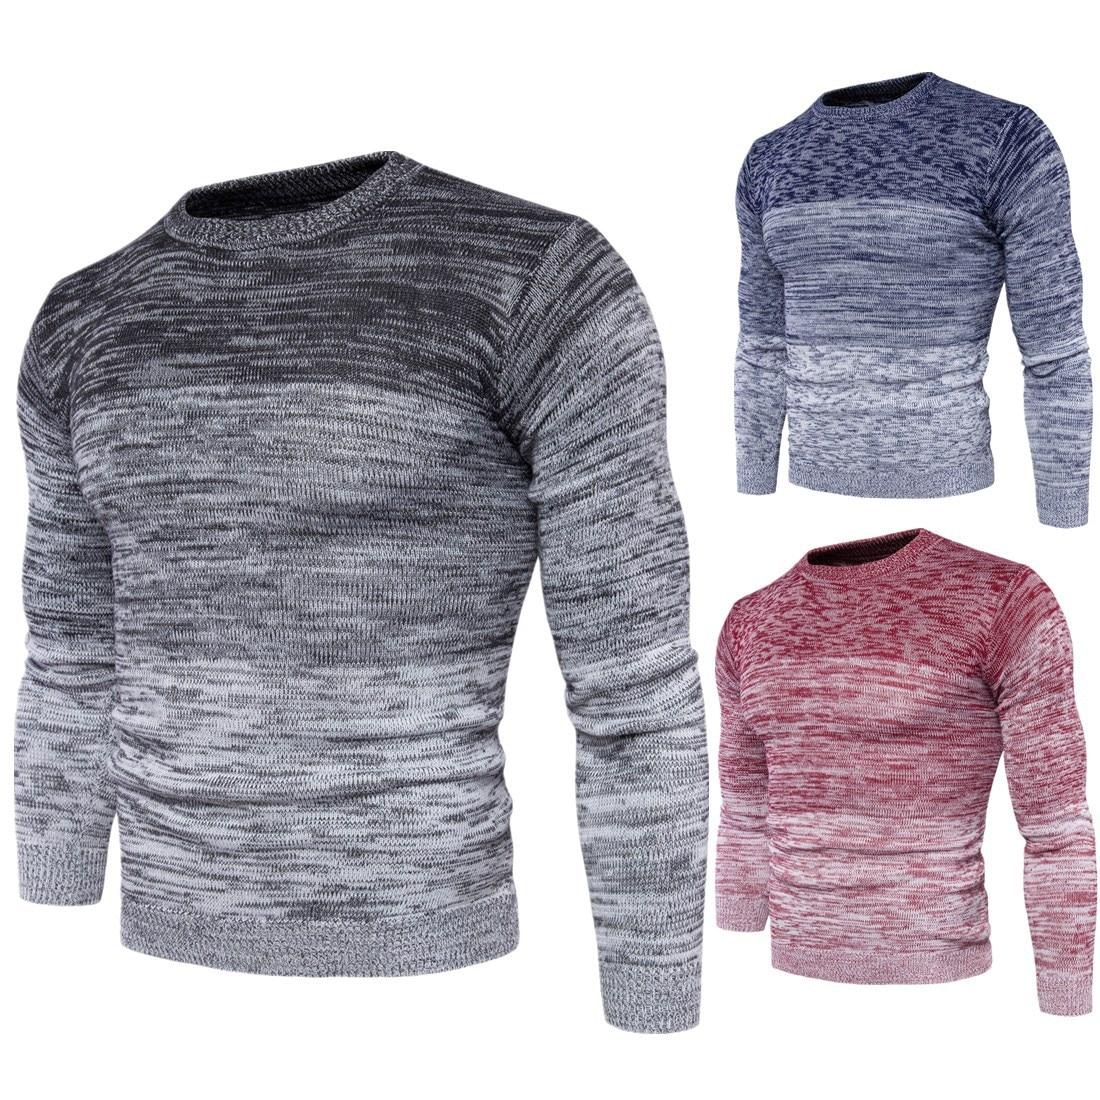 Sweater Men 2019 New Men's Knitting Sweater Coat Men's Sweater Q6263